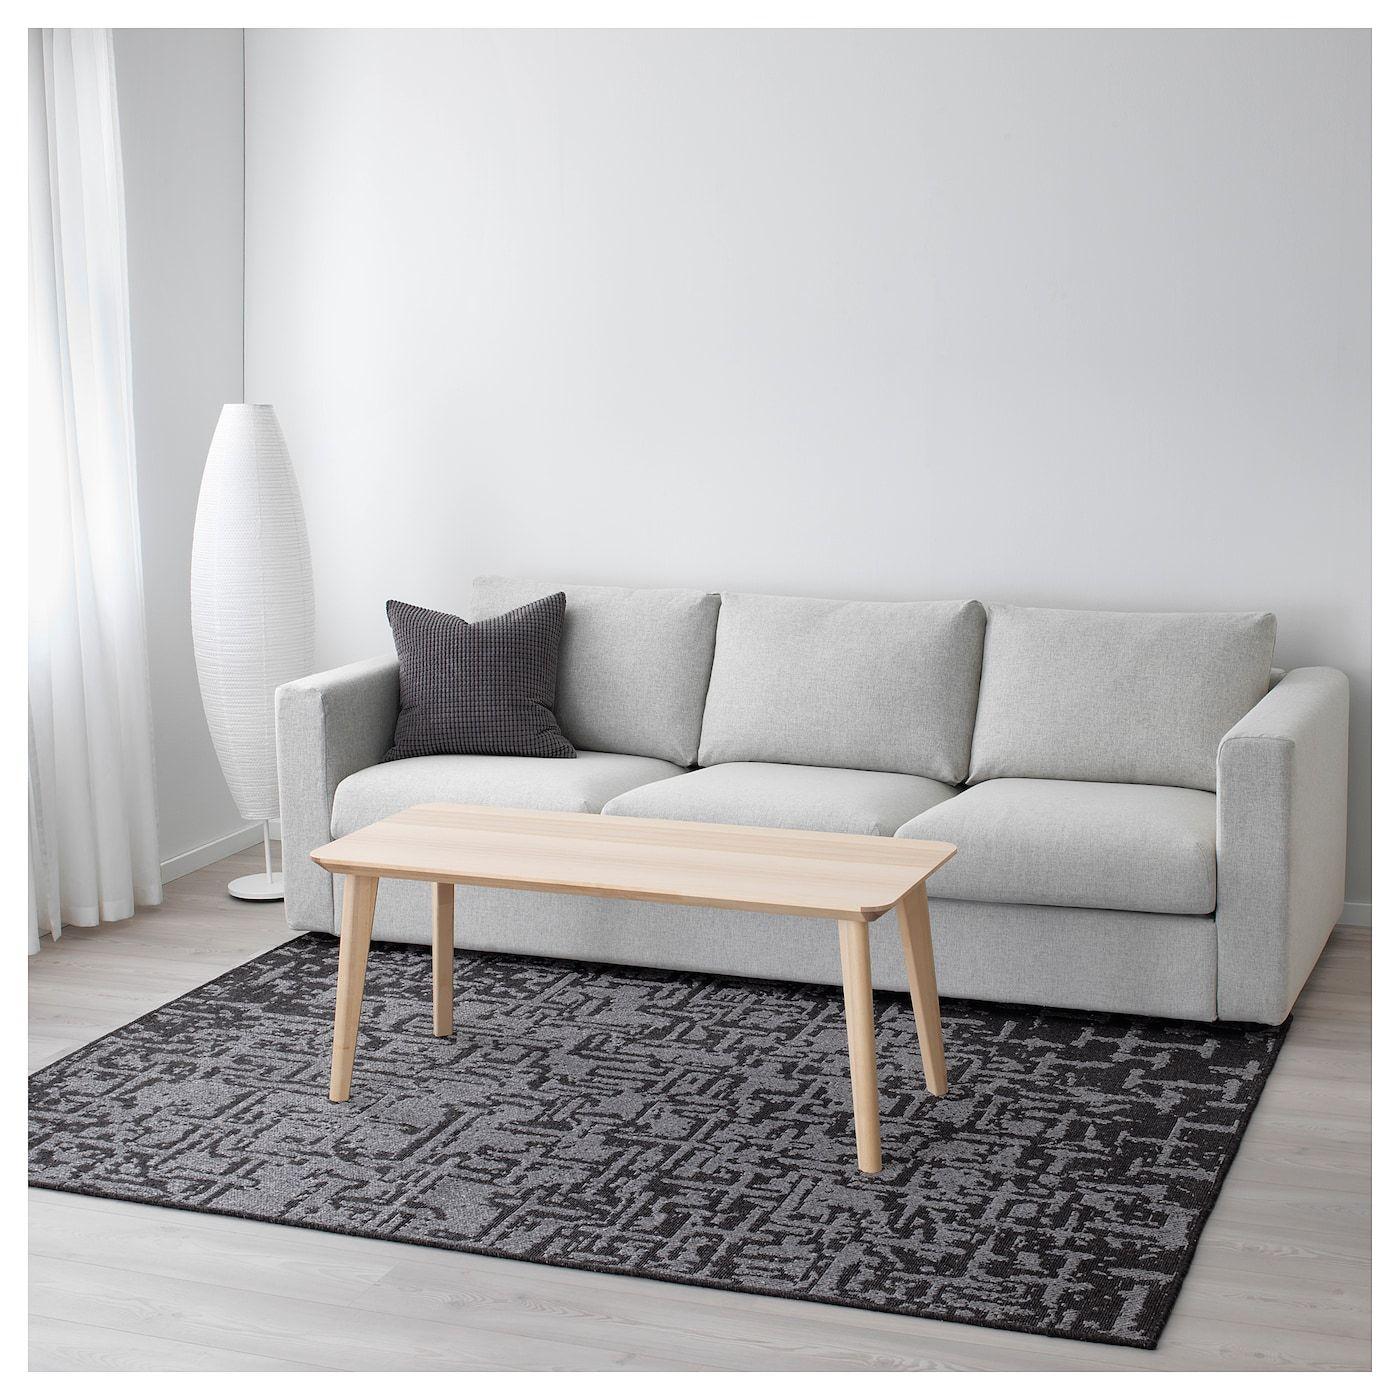 IKEA GLUMSÖ Rug, flatwoven dark gray Ikea grey rug